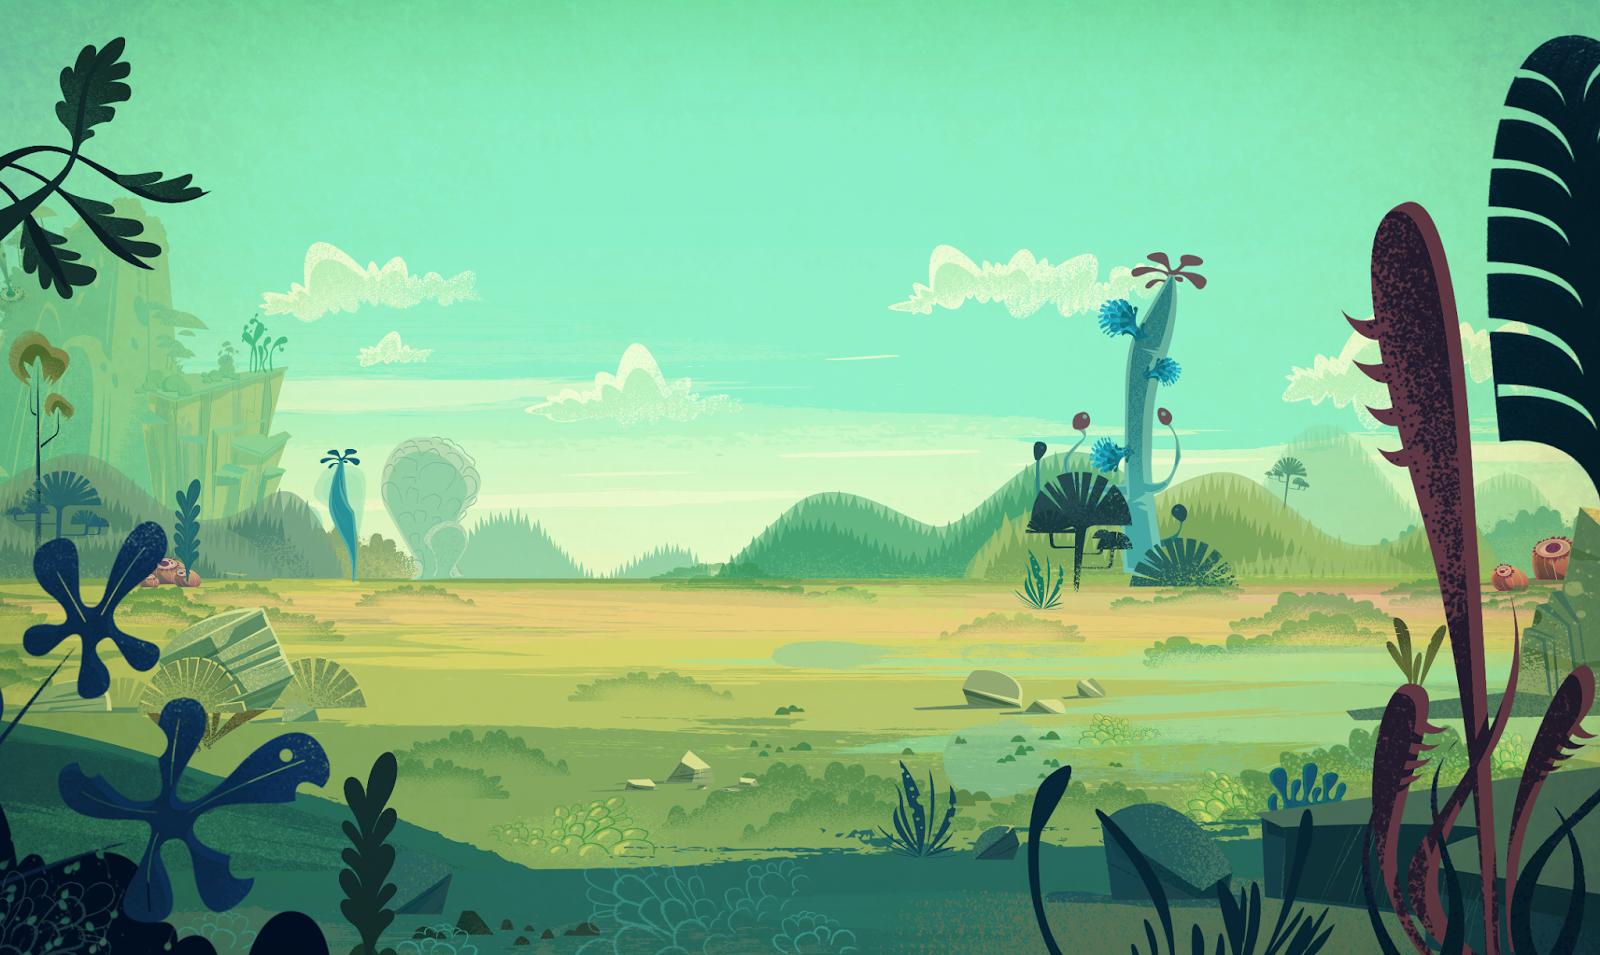 Wallpaper Illustration Graphic Design Roar Movie: JAMES GILLEARD: 11/01/2015